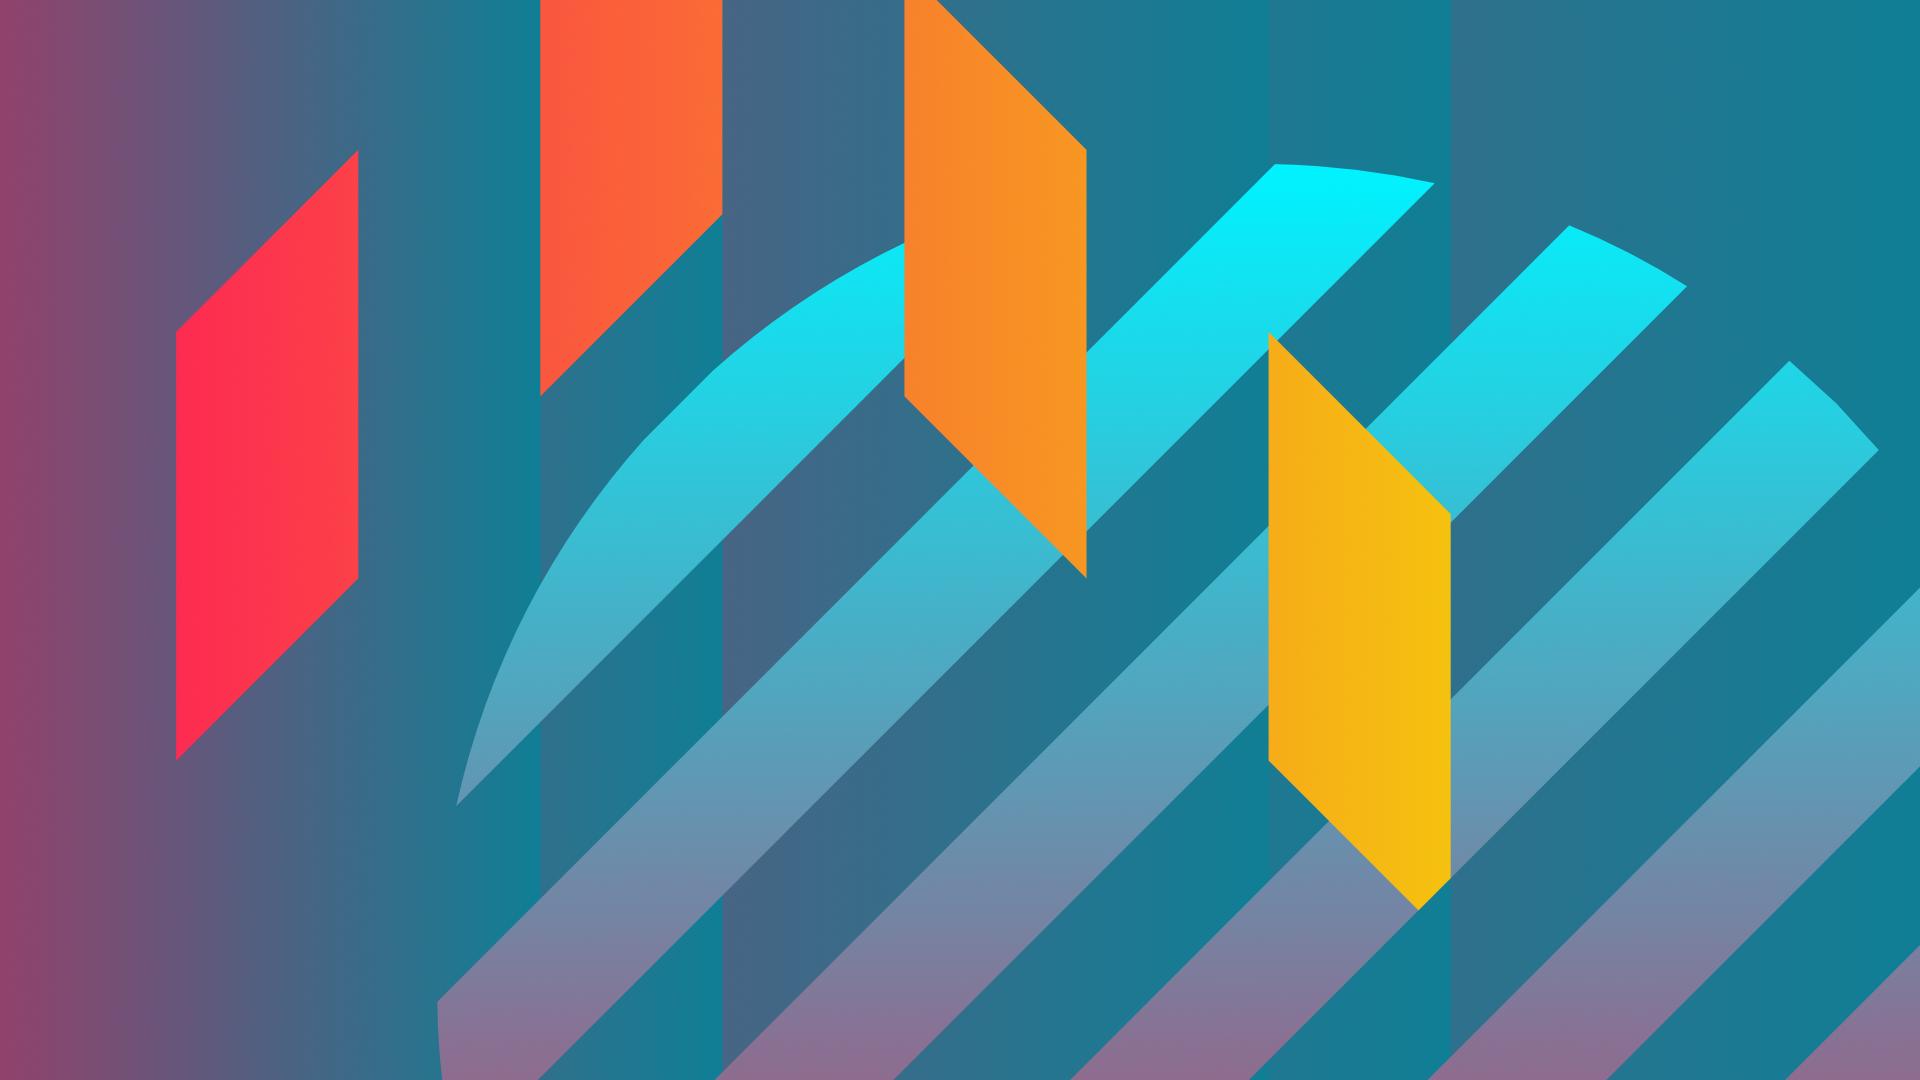 Wallpaper : colorful, blue, orange, neon, Flatdesign ...